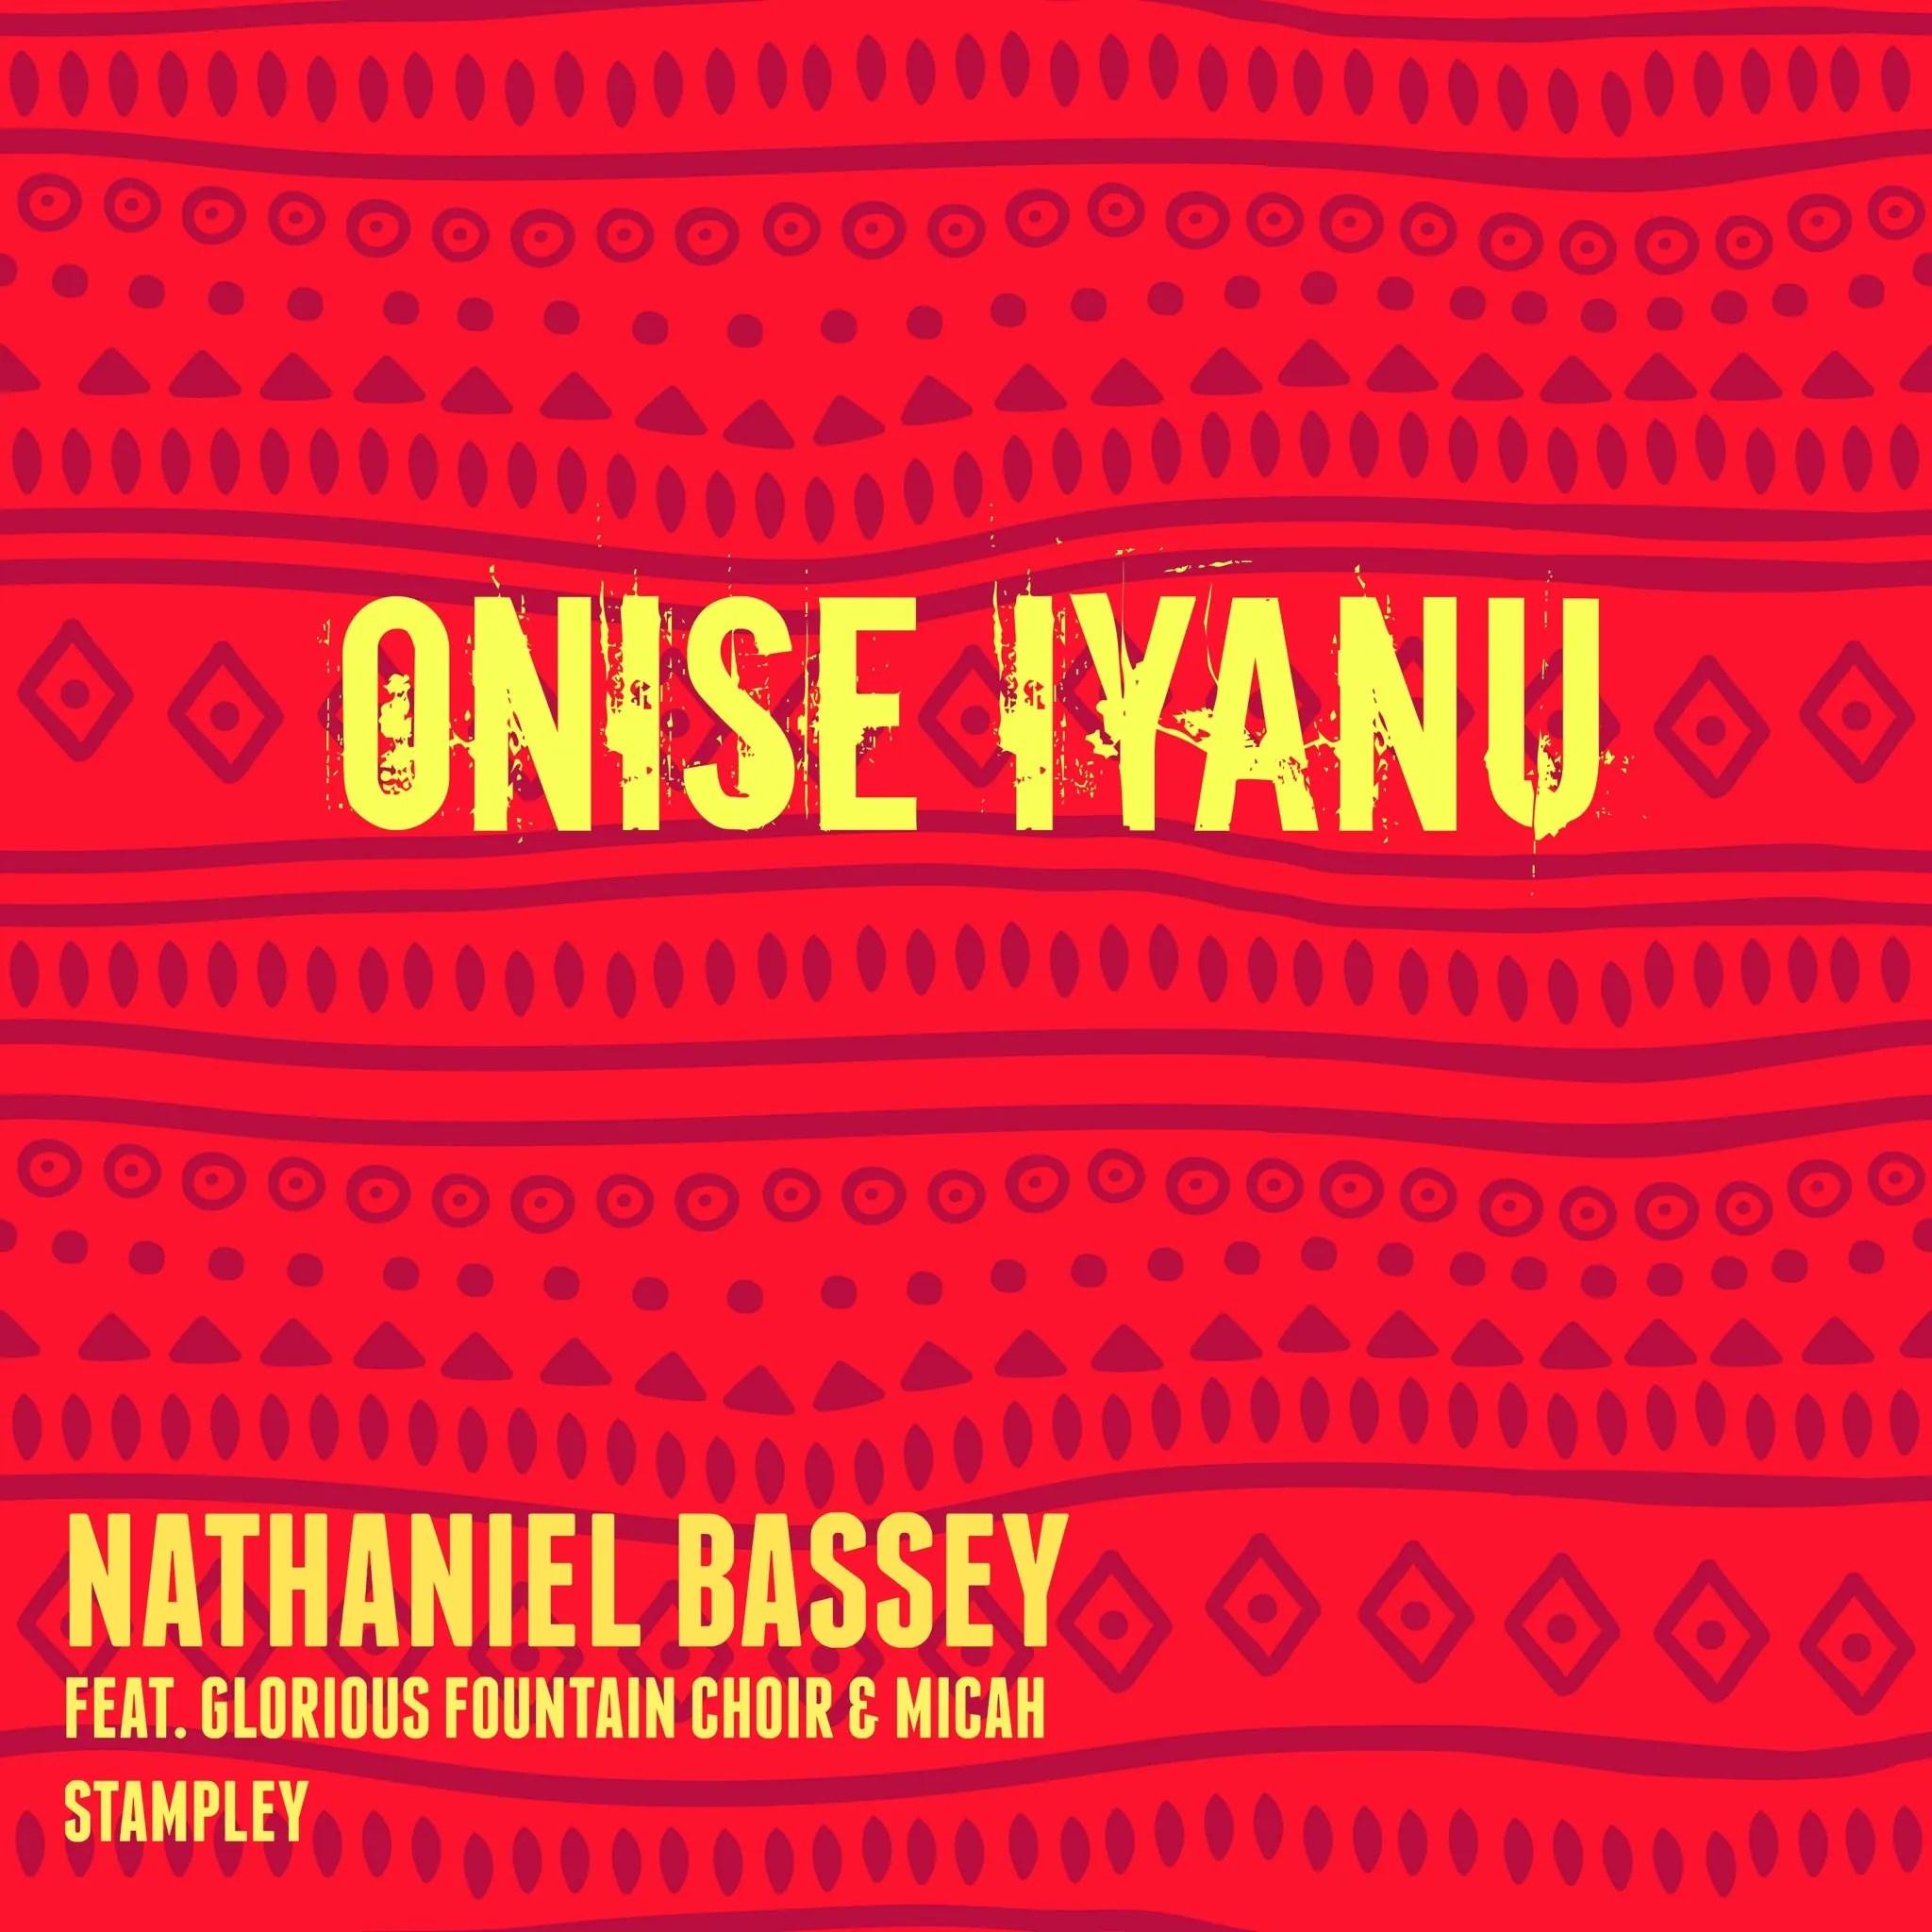 Chords Nathaniel Bassey Onise Iyanu Chord Progression On Guitar